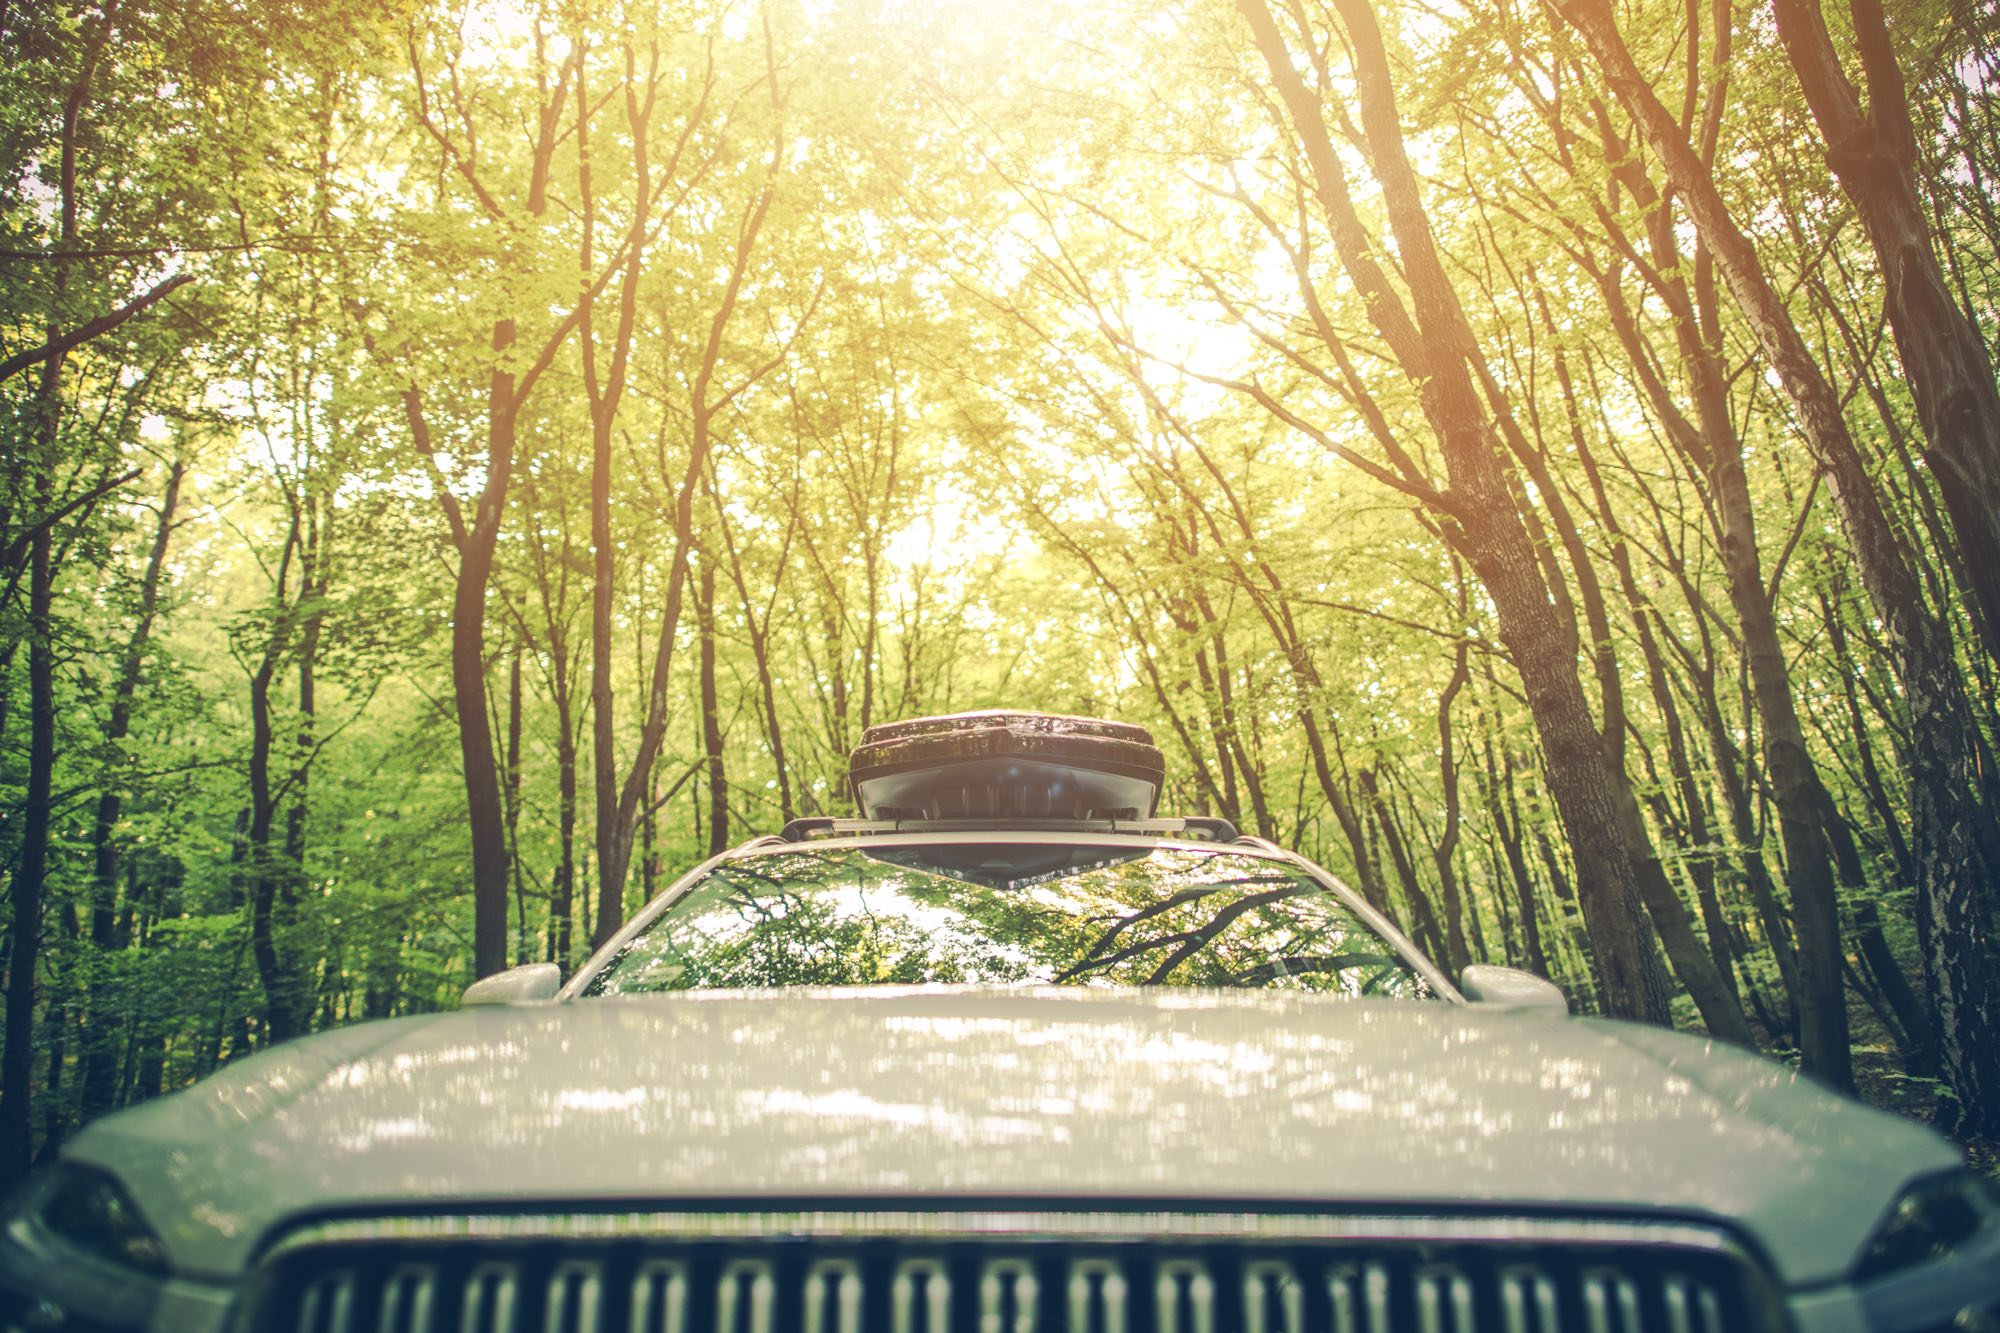 road-trip-checklist-driving